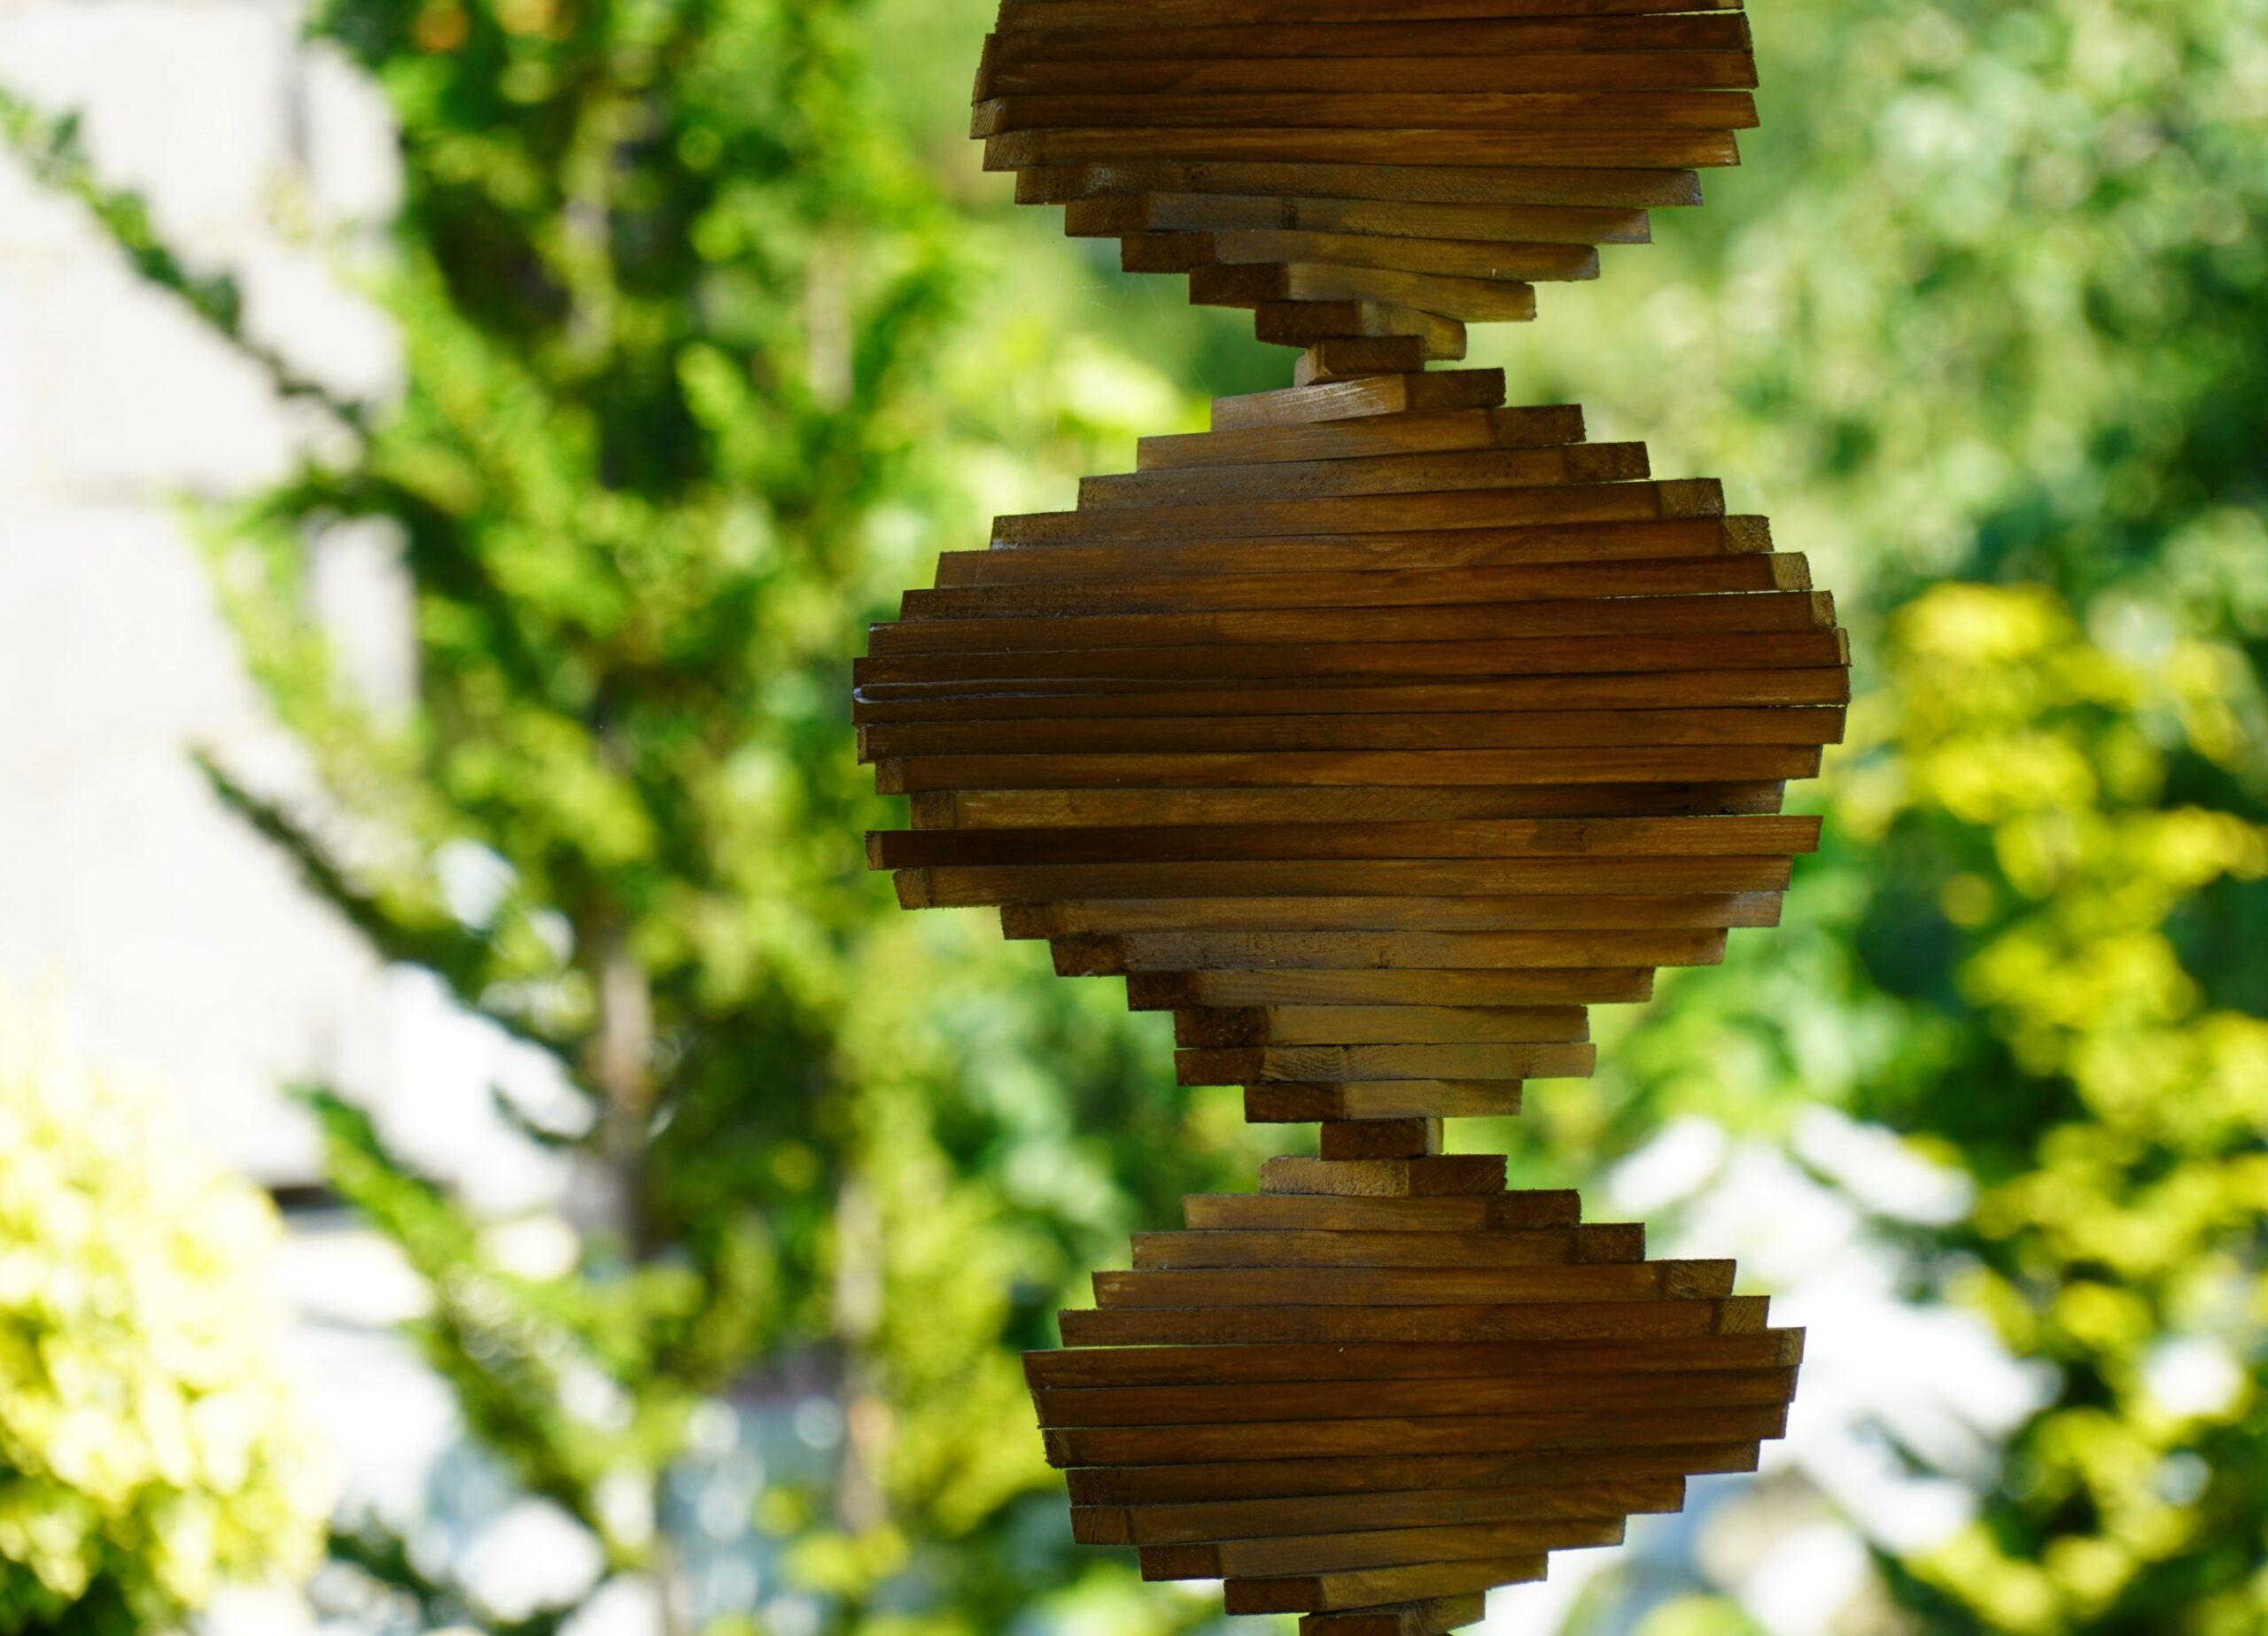 Genetic ARVC Wooden Double Helix Representation